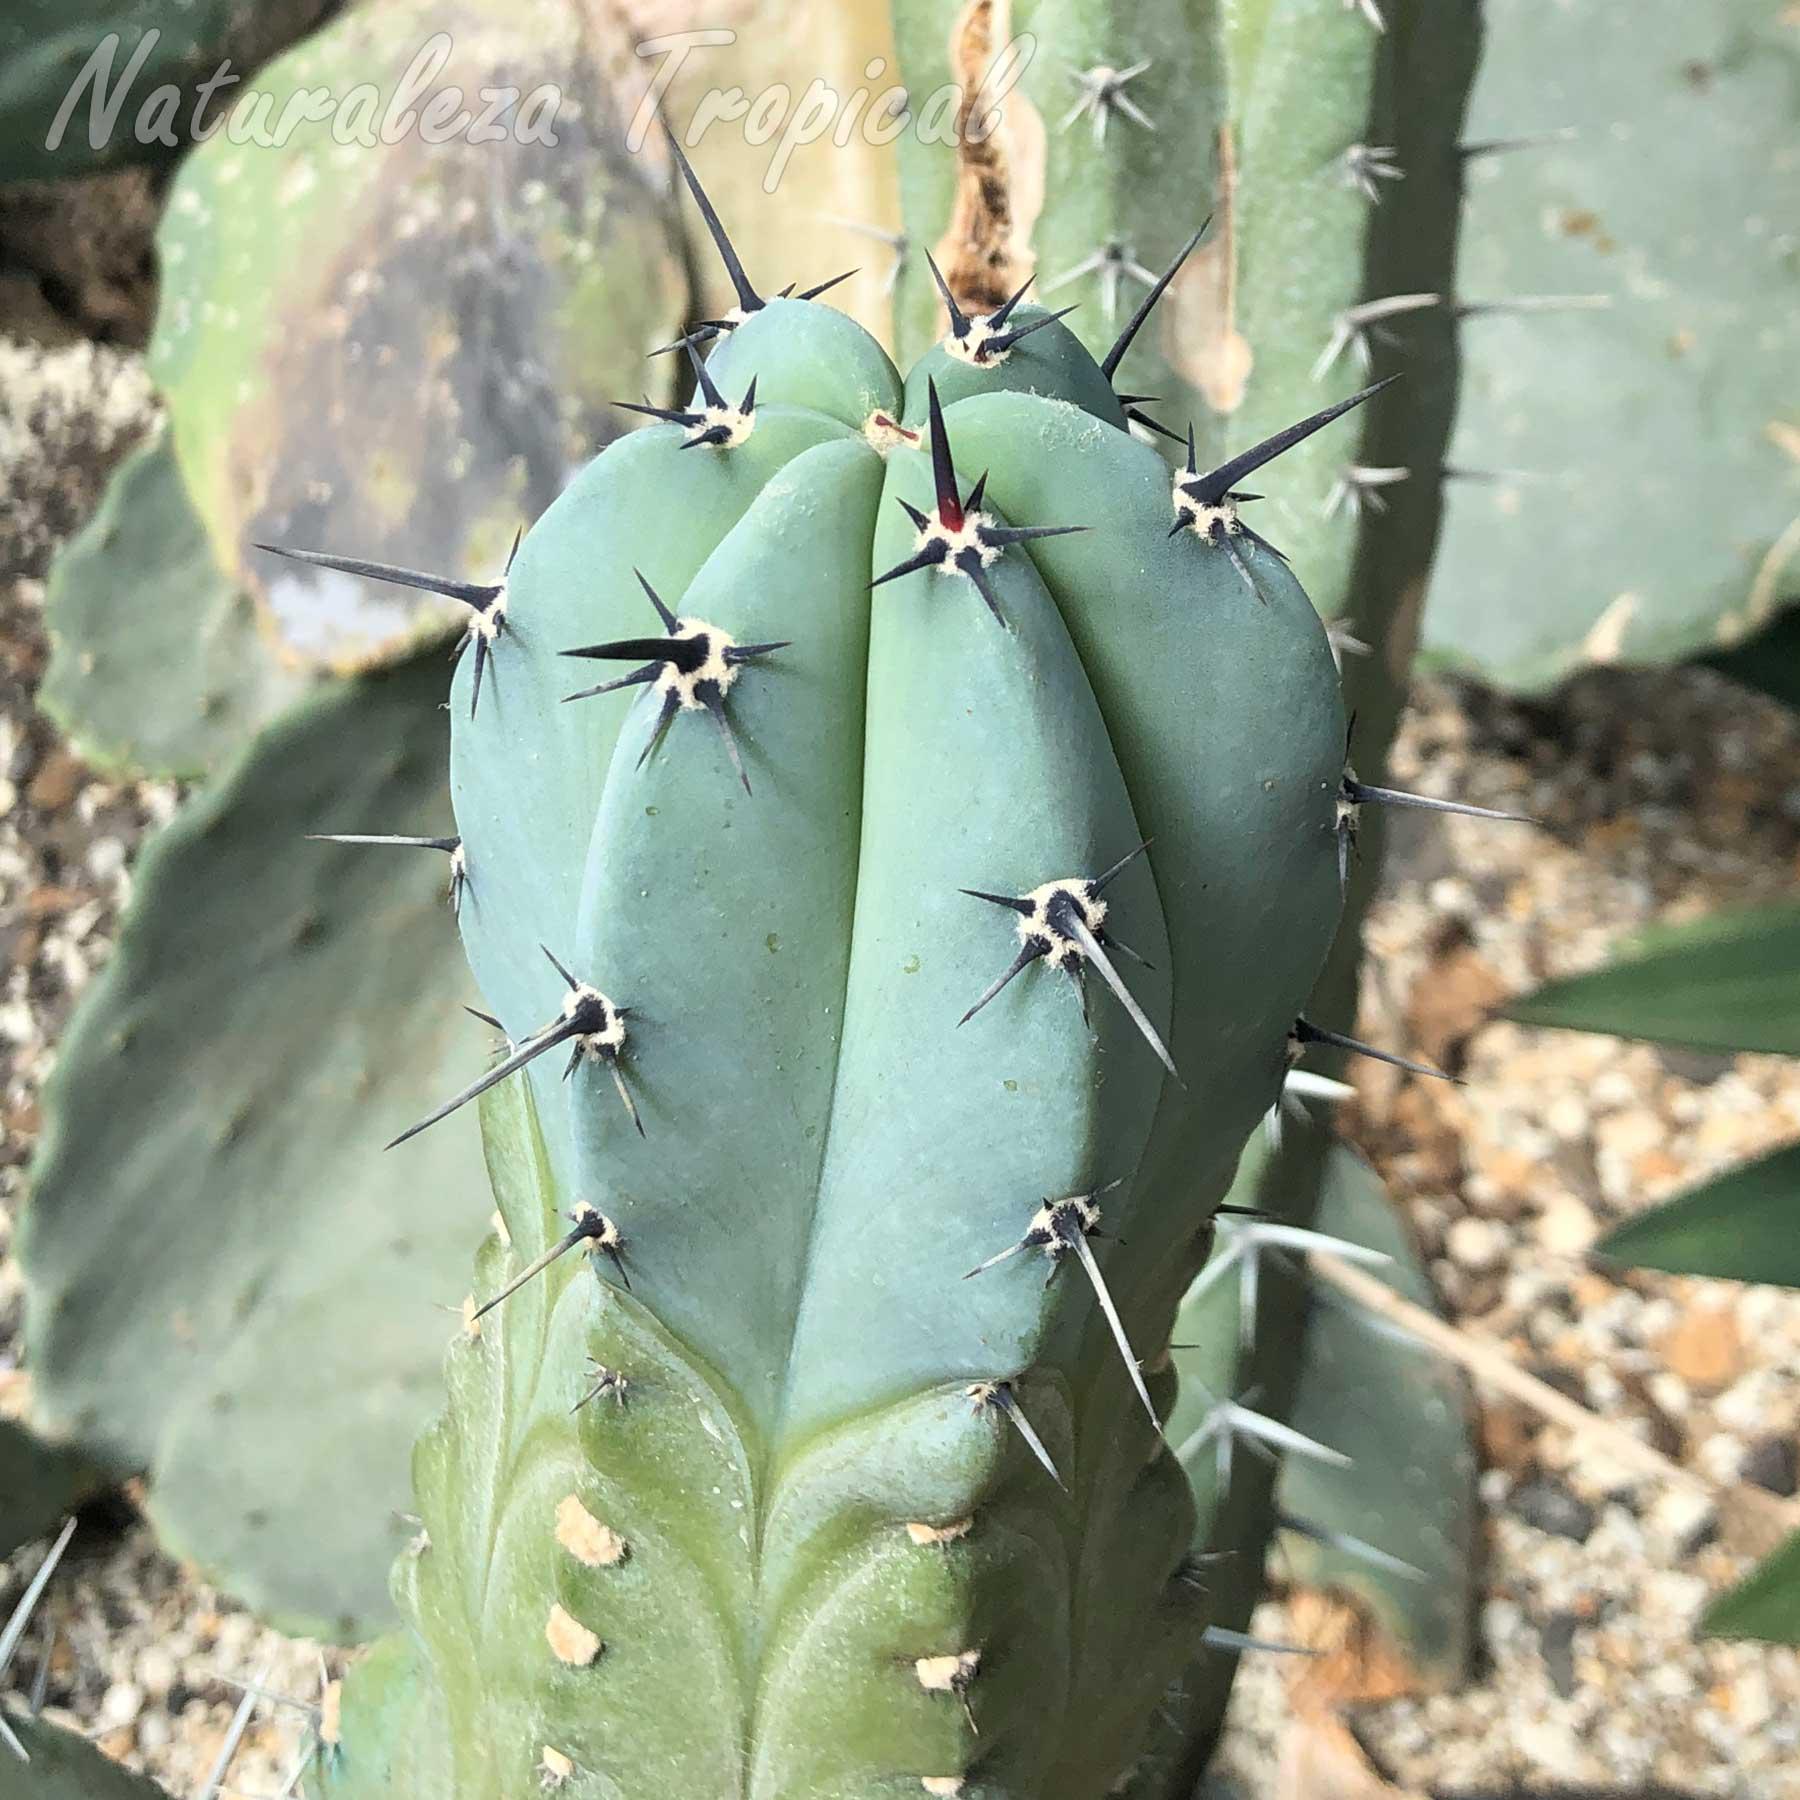 Otra imagen del tallo del cactus Myrtillocactus geometrizans